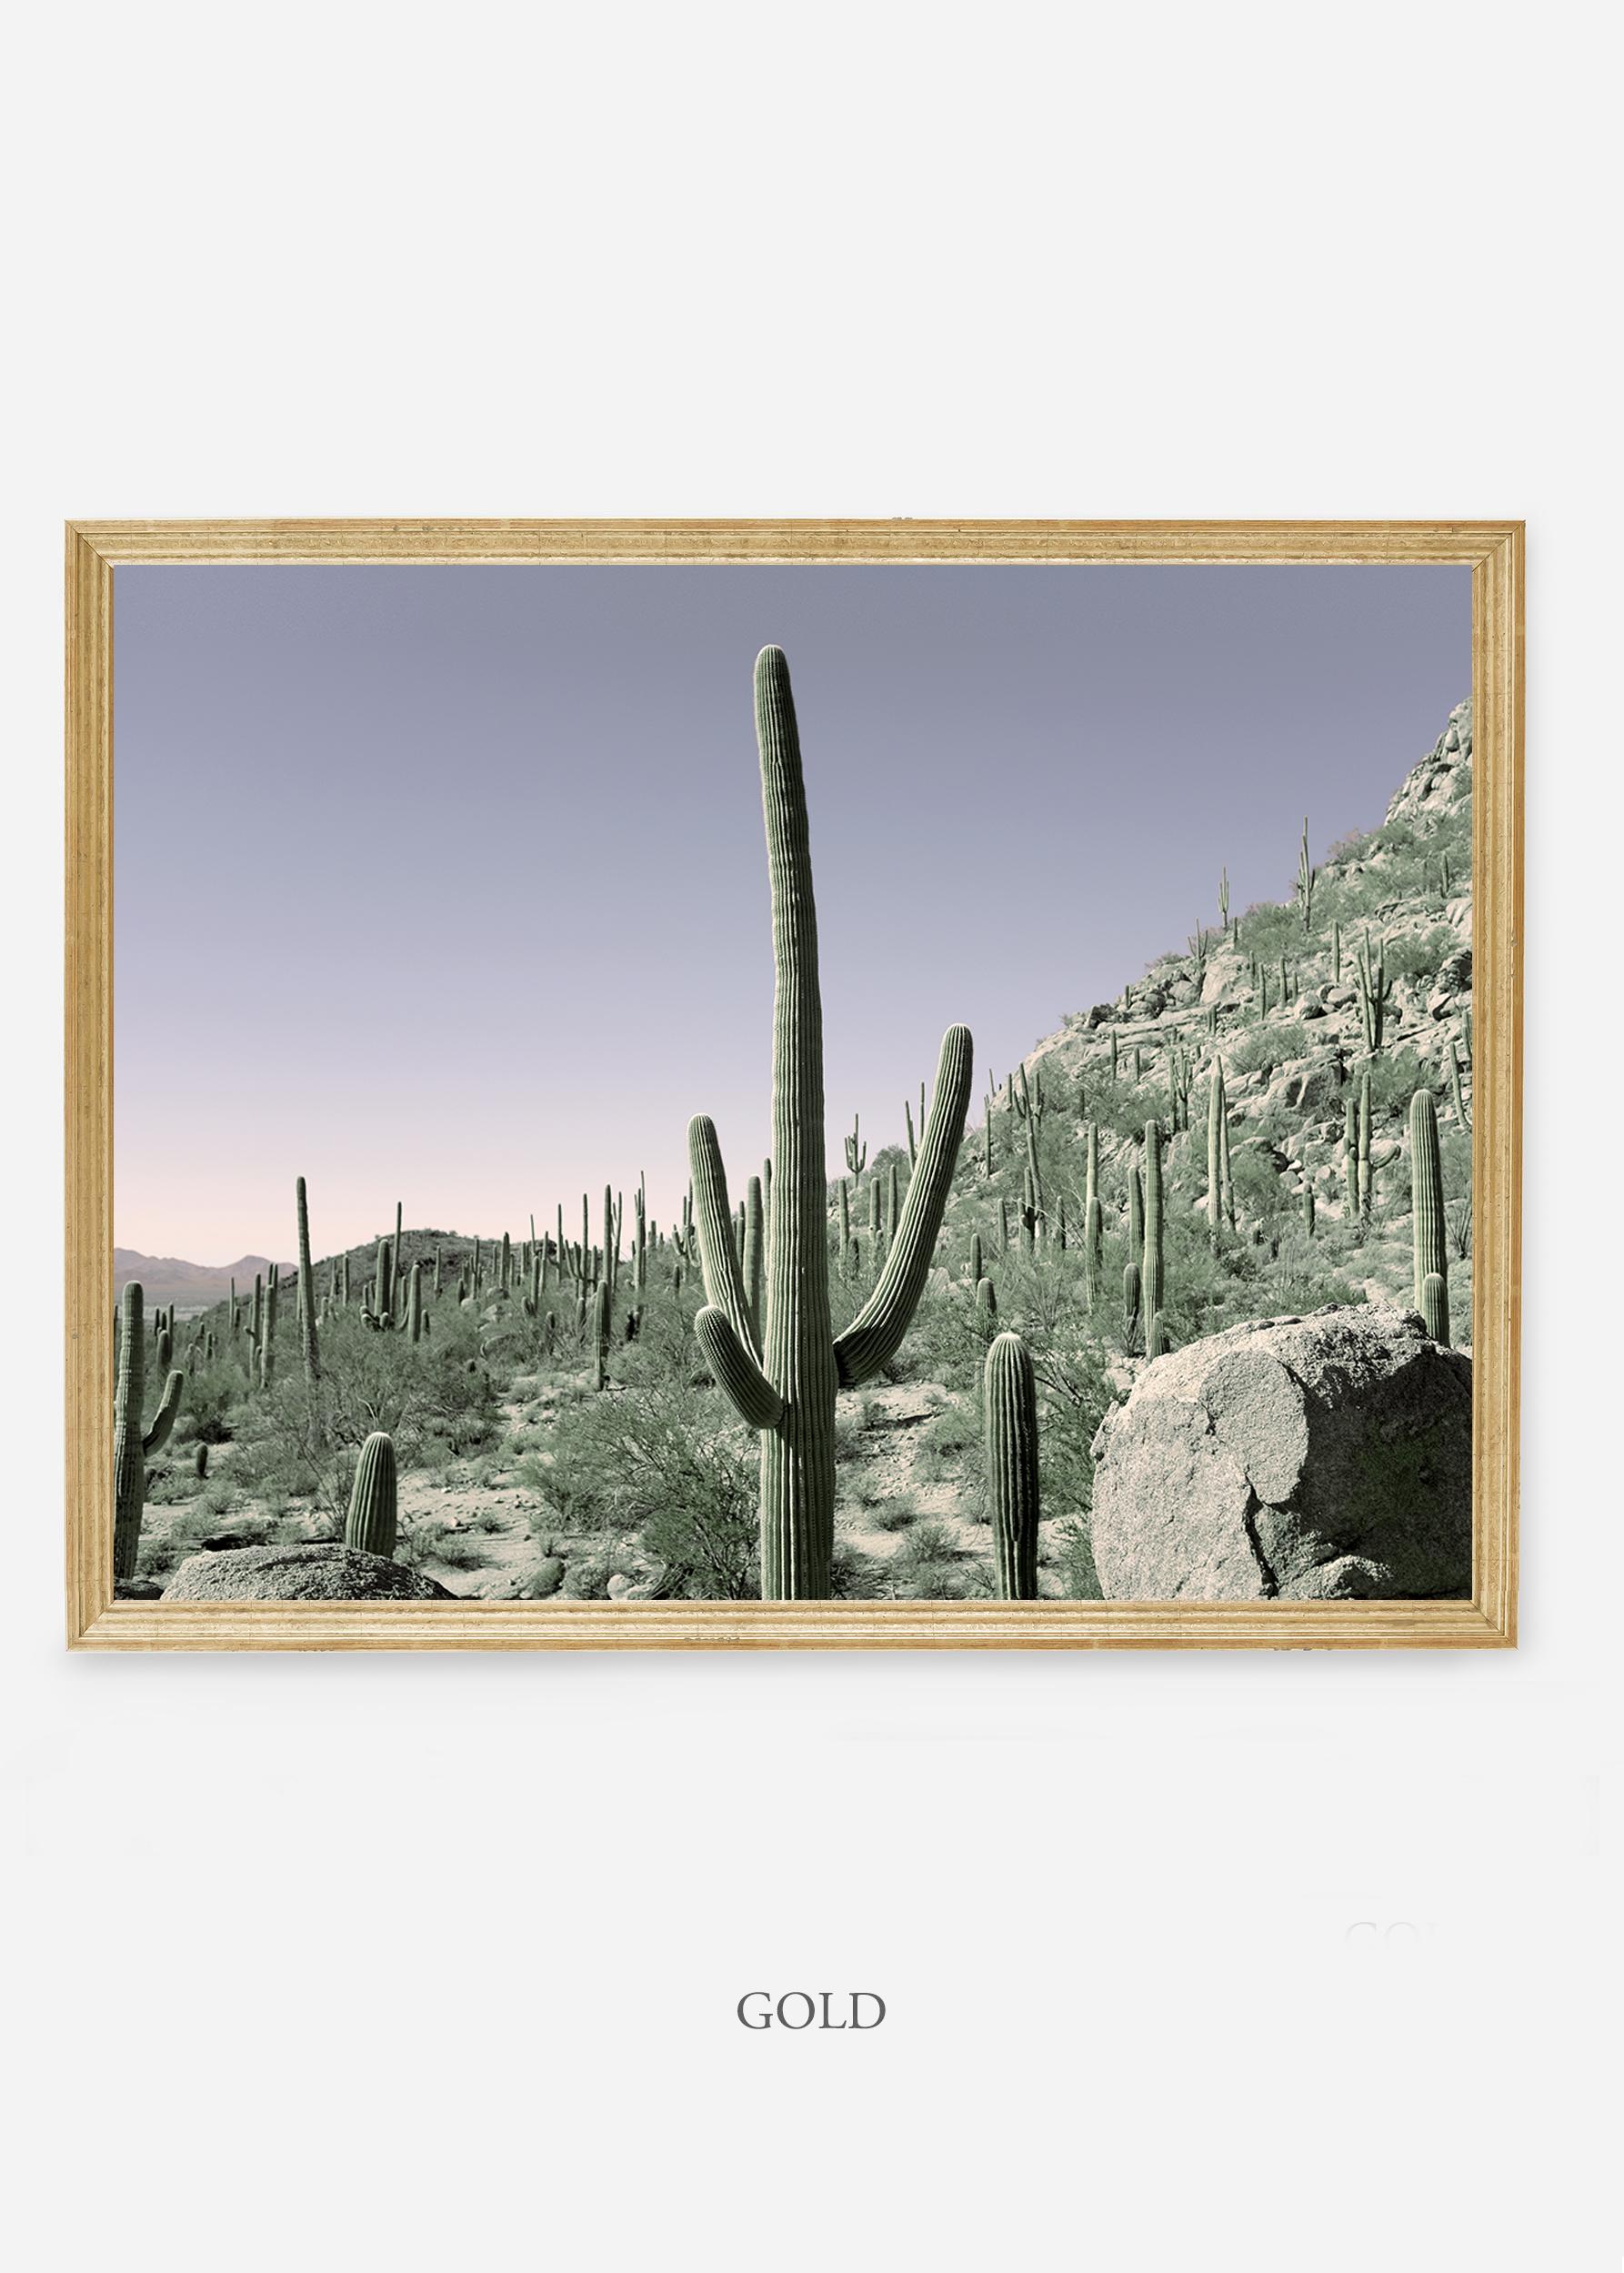 nomat-goldframe-saguaroNo.13-wildercalifornia-art-wallart-cactusprint-homedecor-prints-arizona-botanical-artwork-interiordesign.jpg